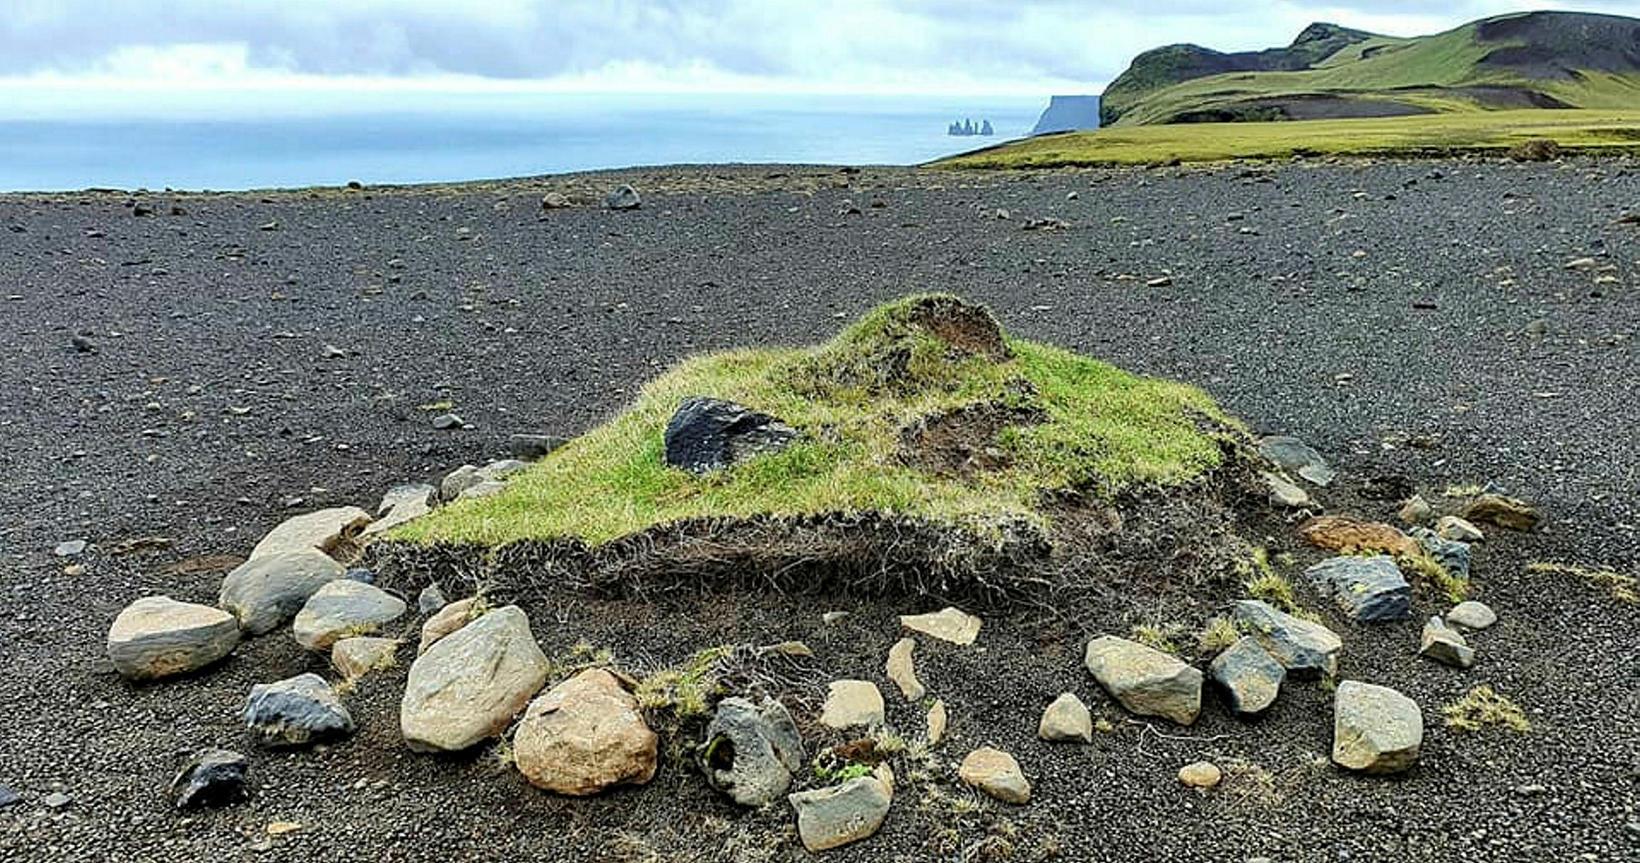 The 'ship' was hidden underneath the grass.